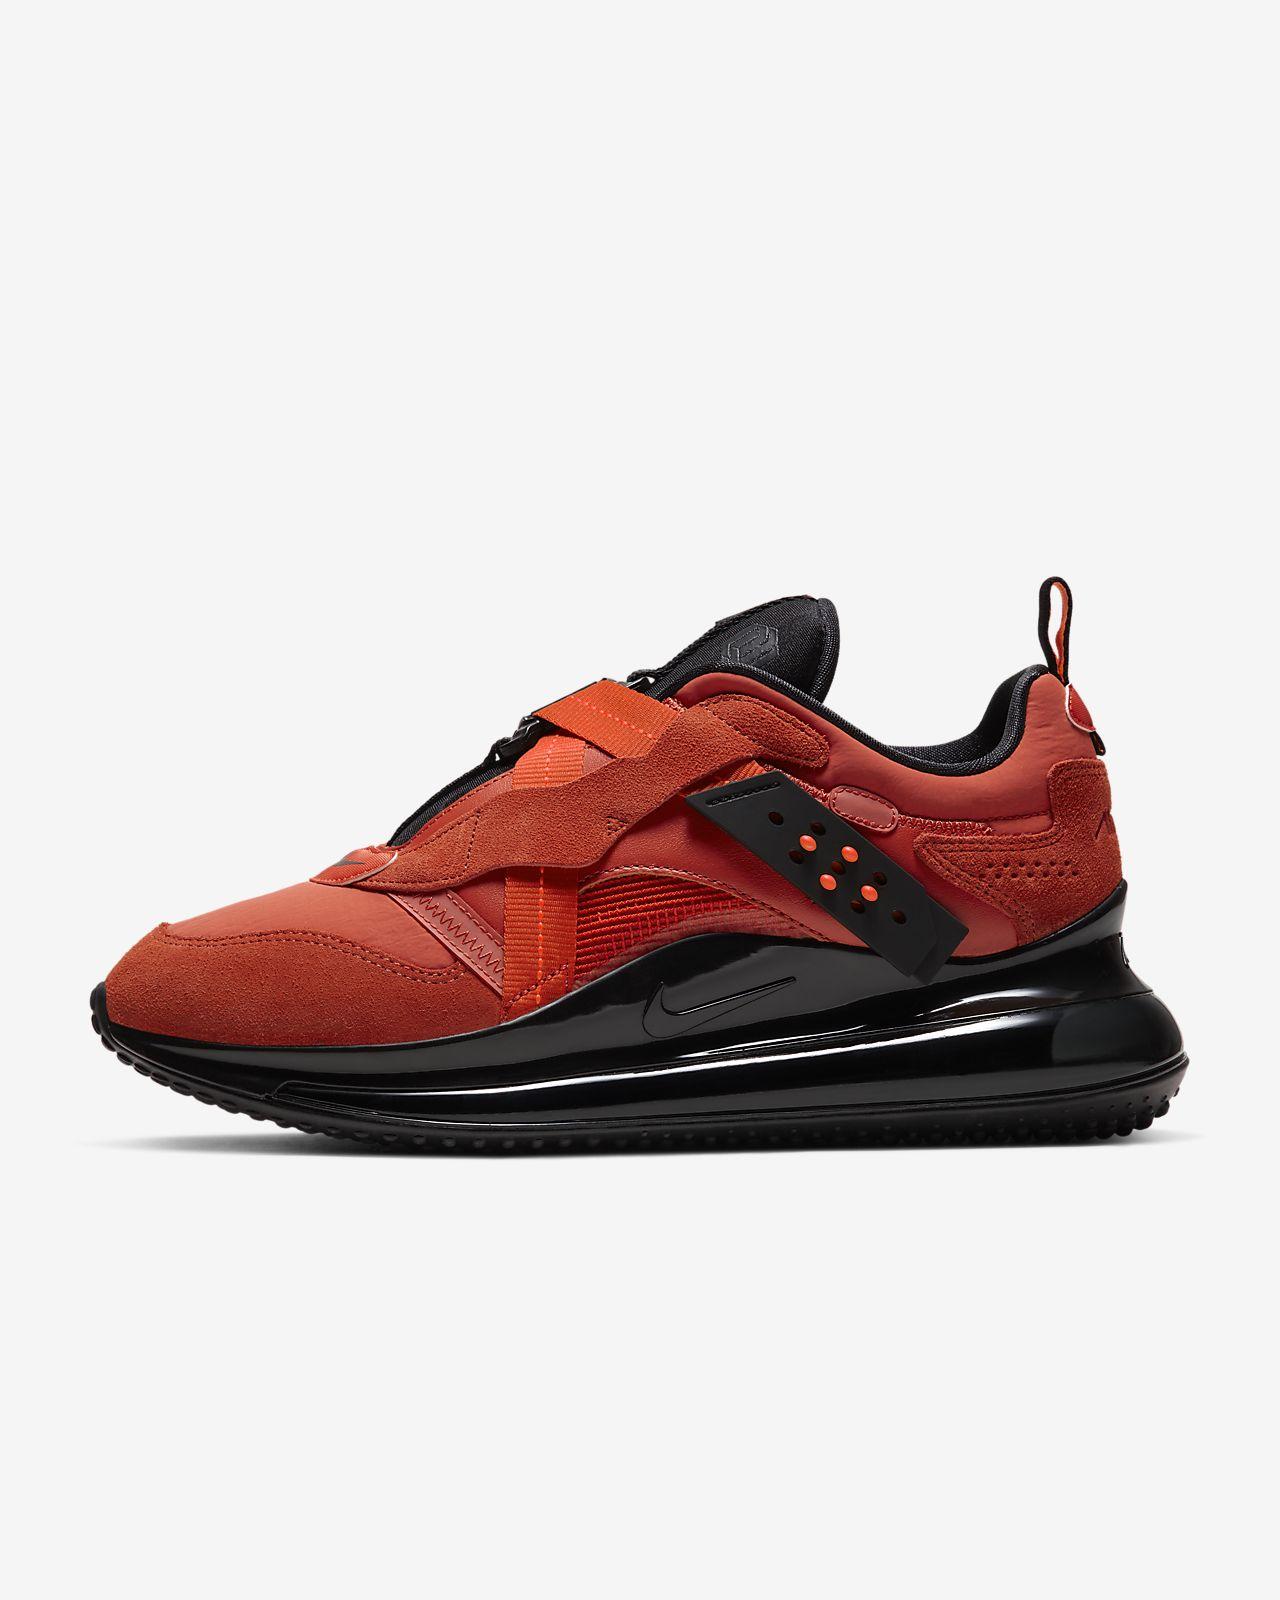 Nike Air Max 720 OBJ Slip Men's Shoe